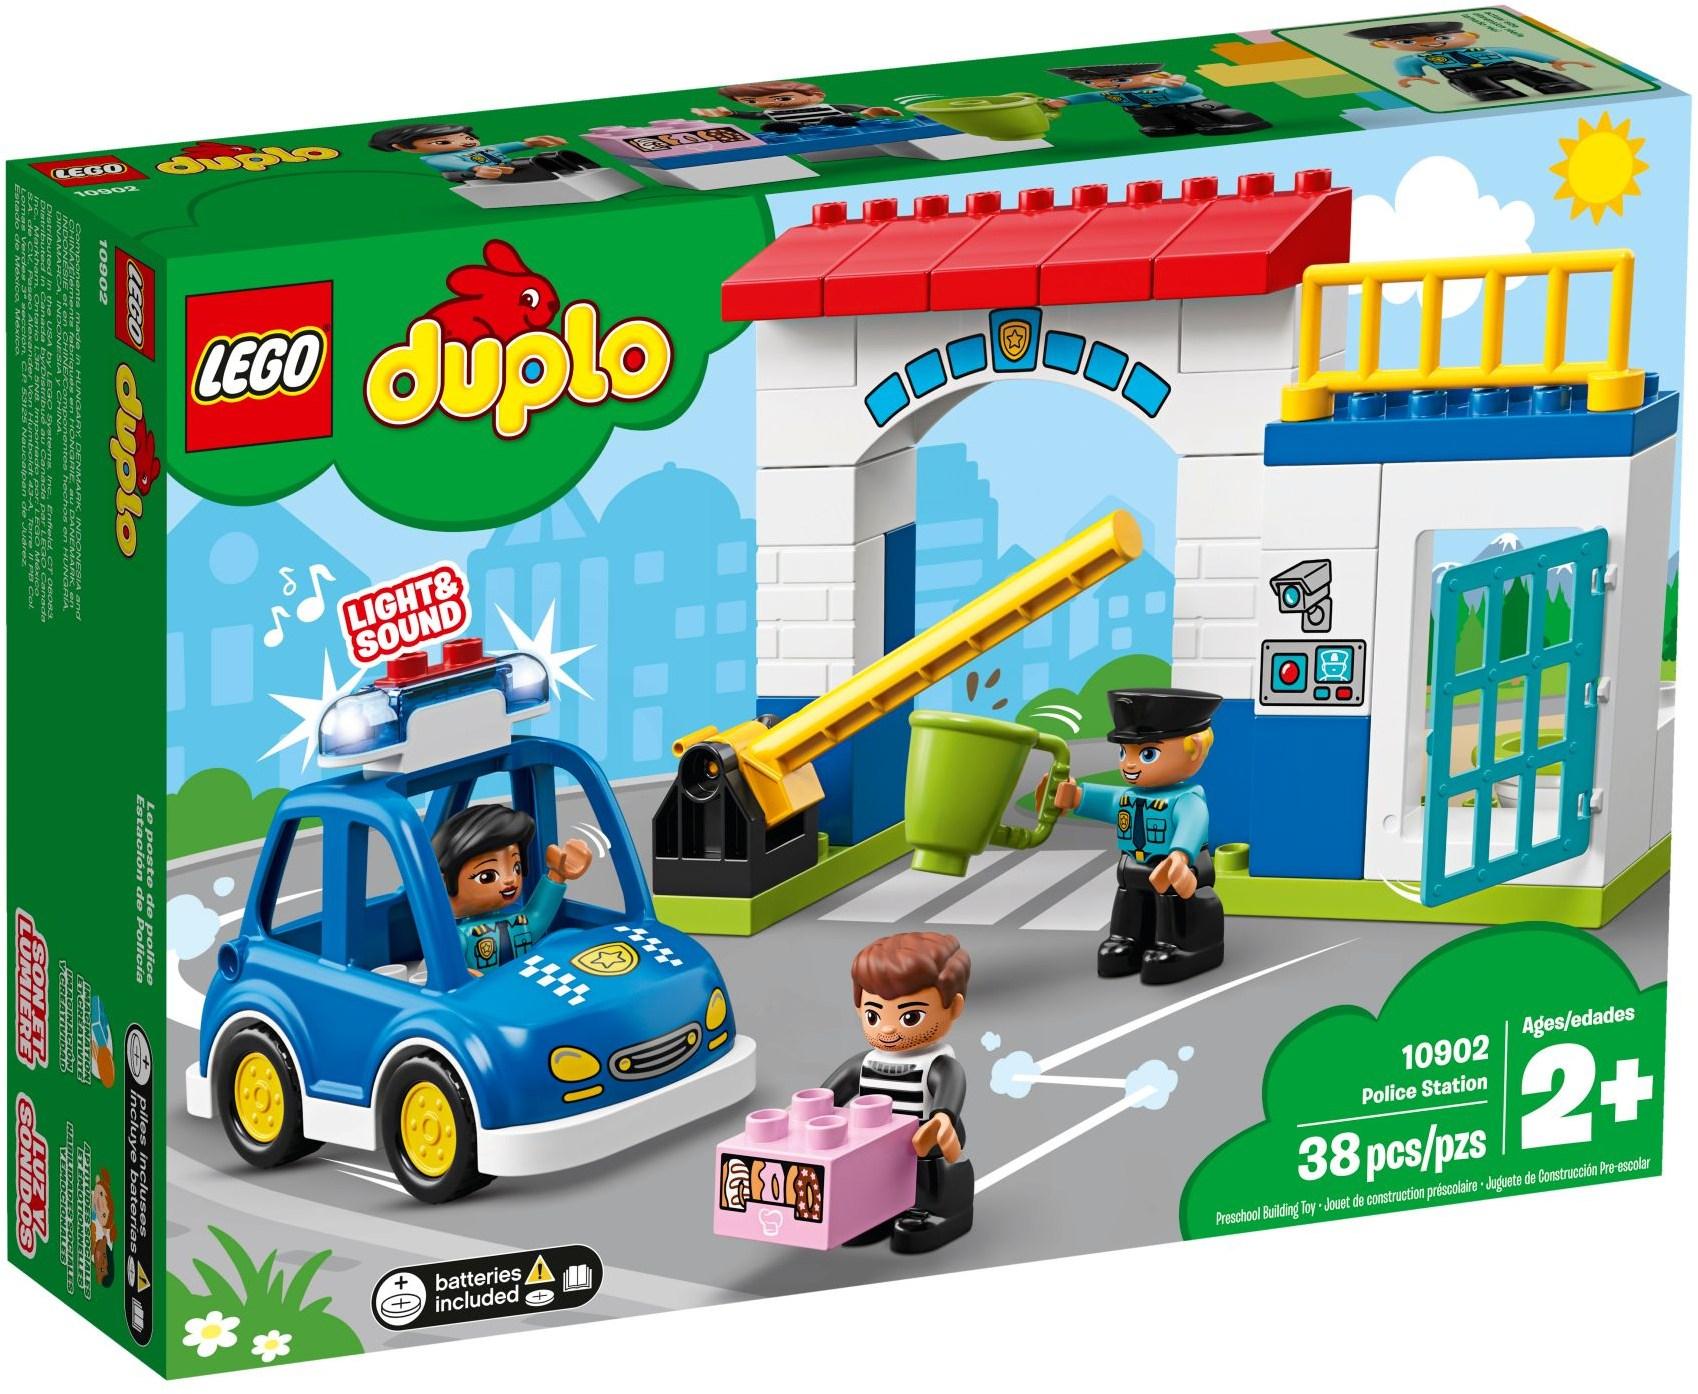 10902 Police Station